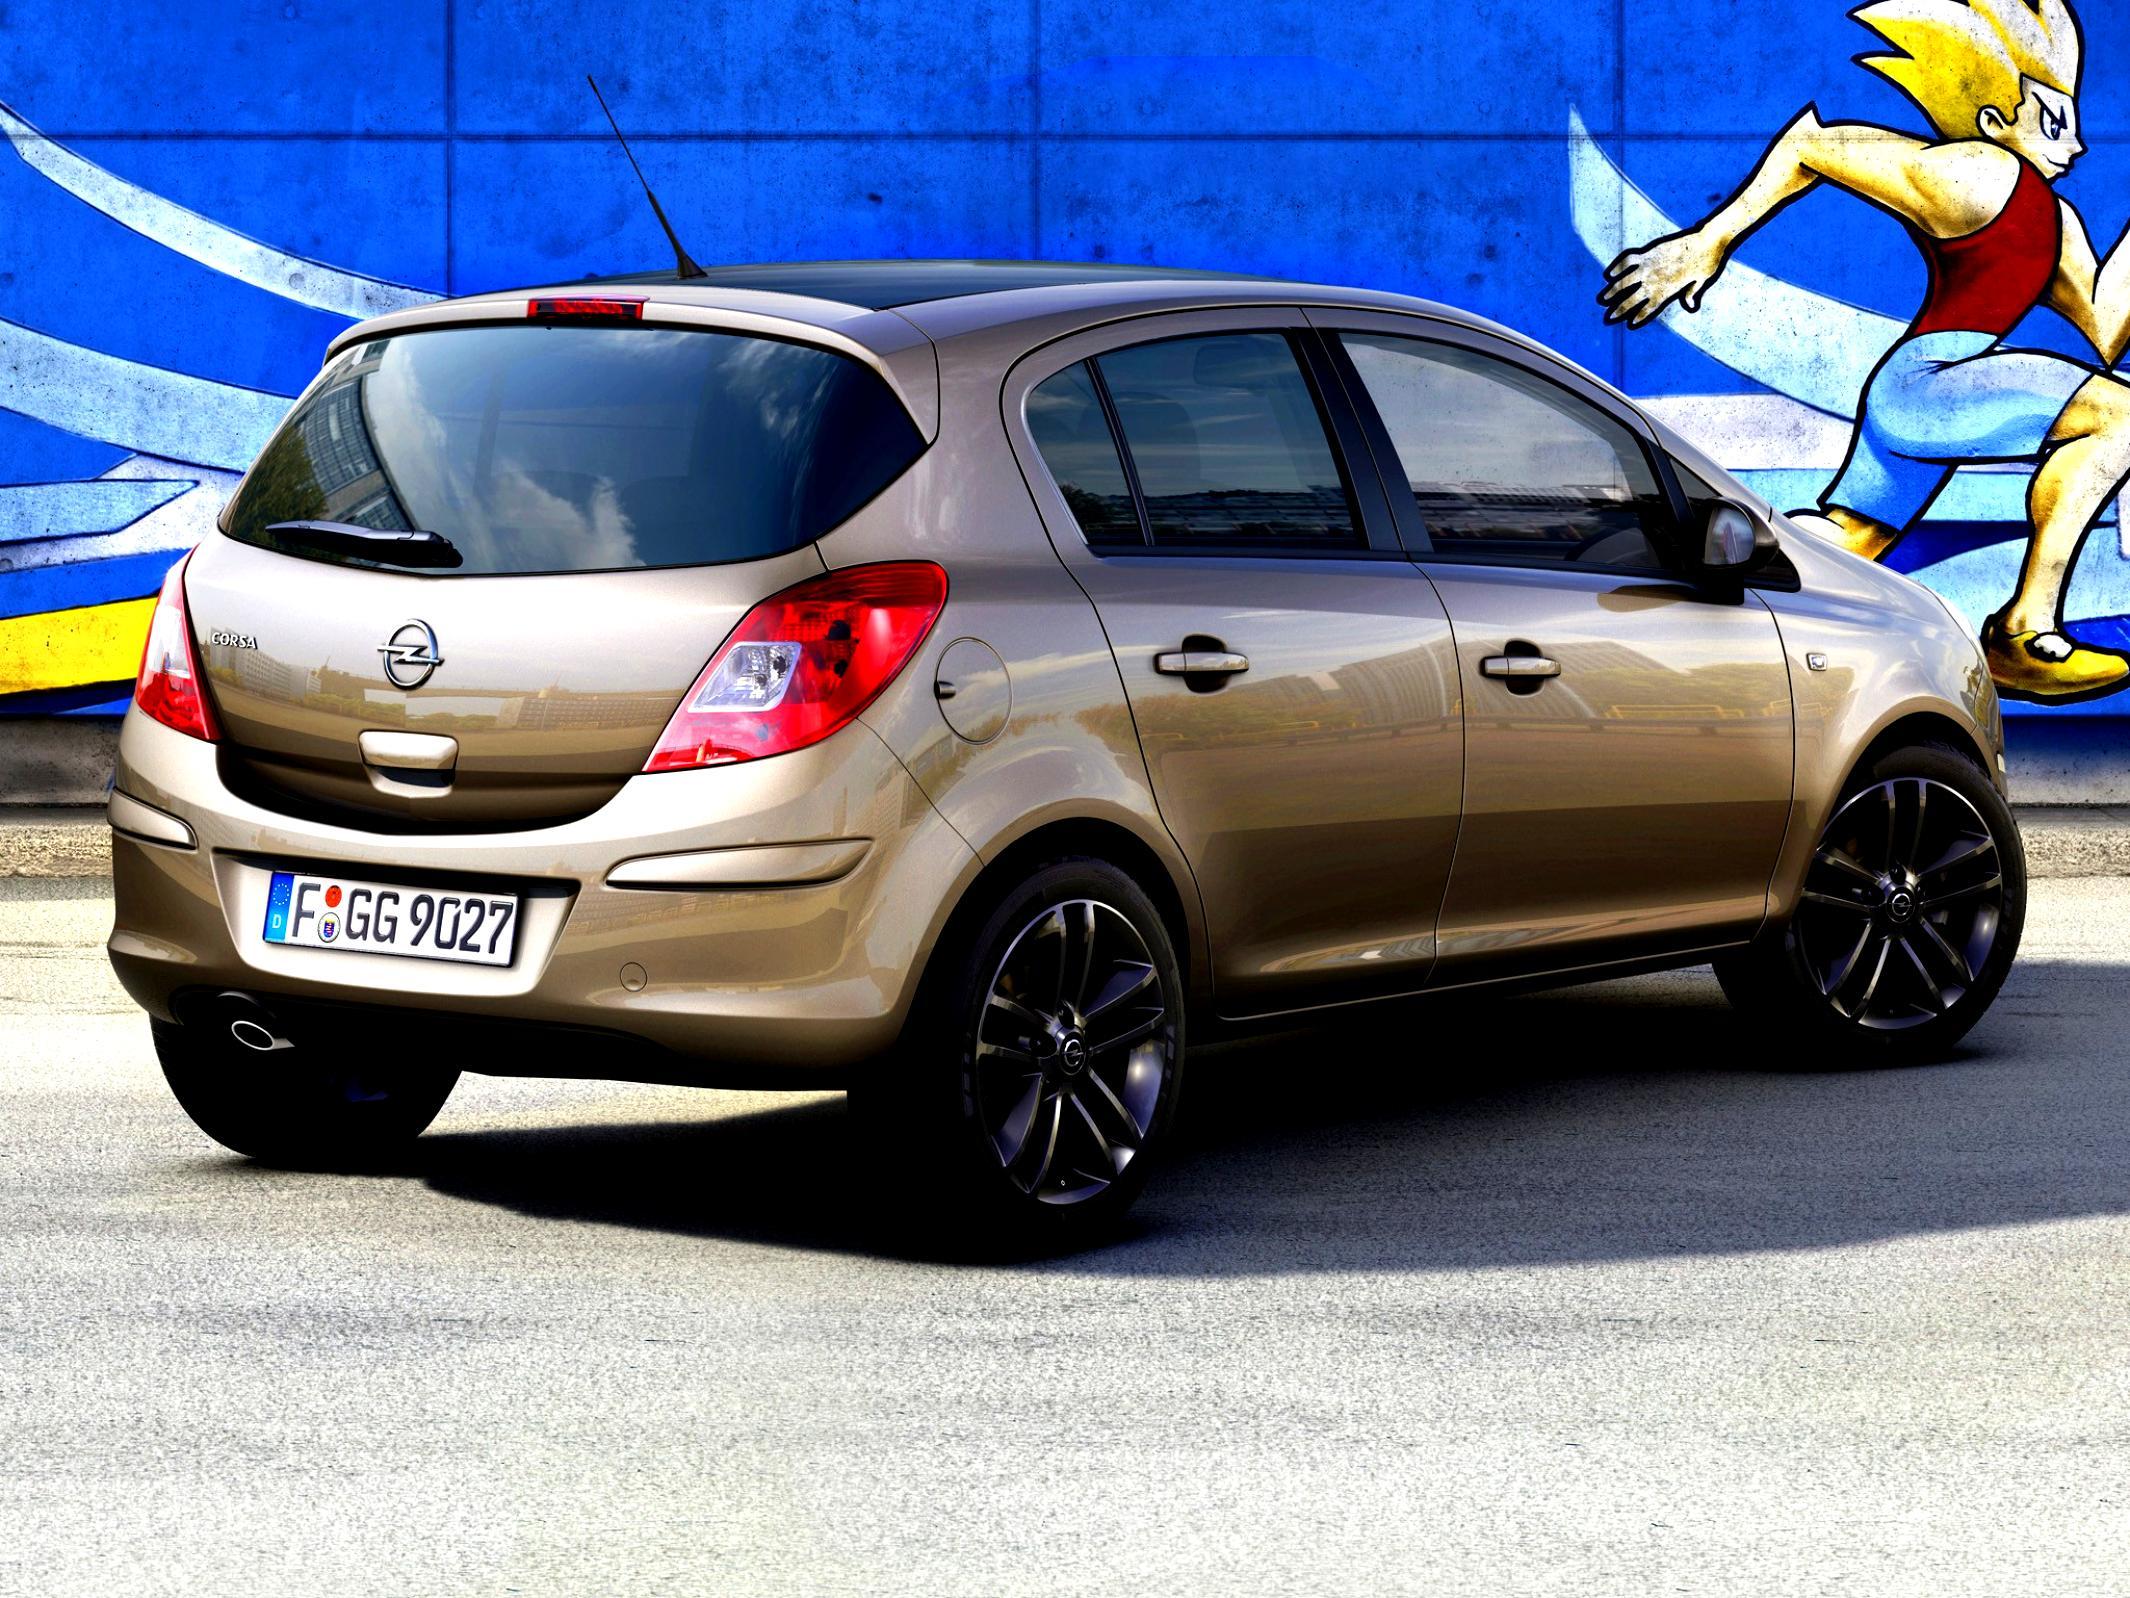 Демонтаж заднего бампера Opel Corsa D